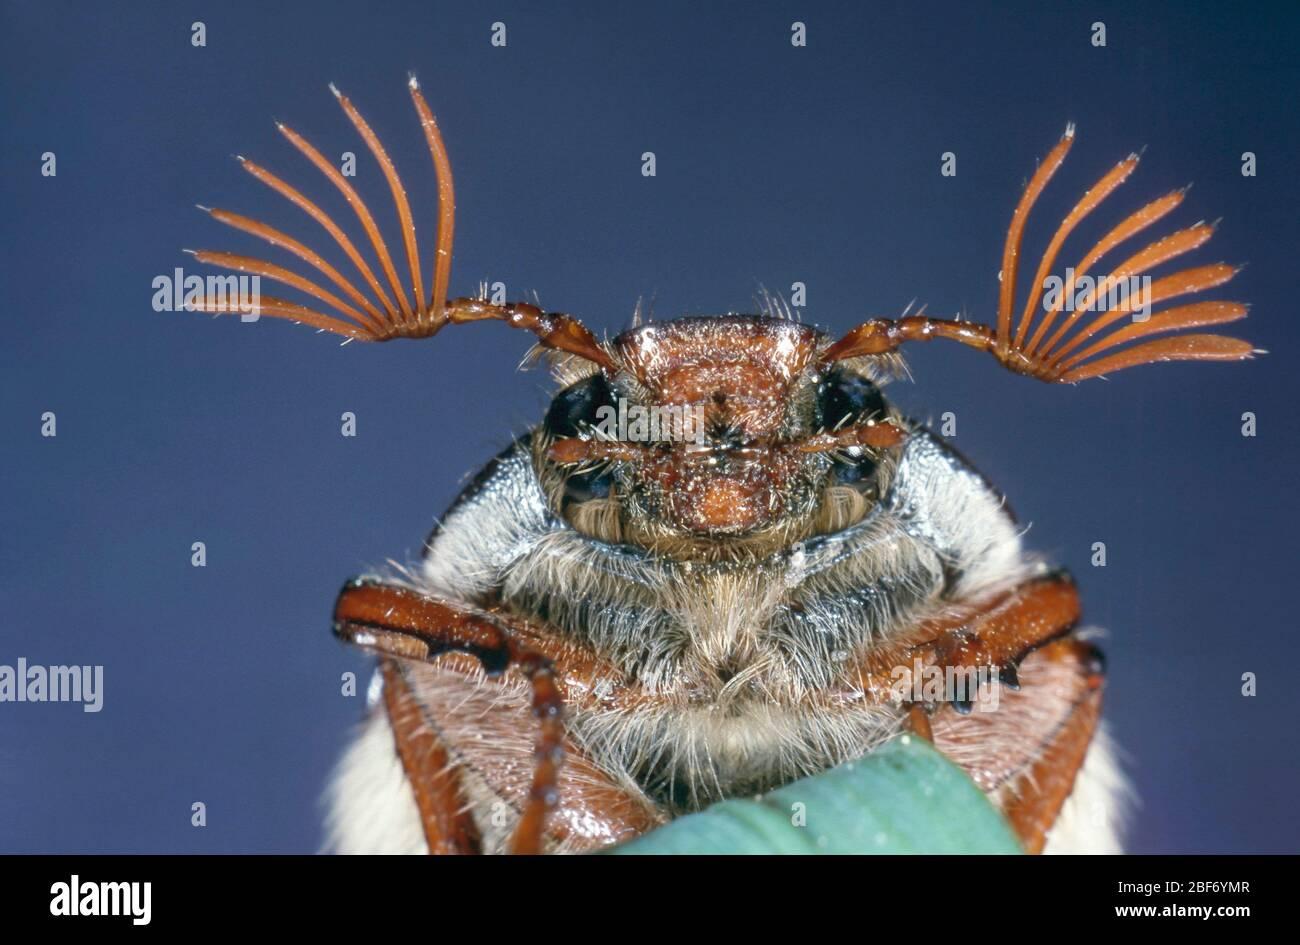 Common cockchafer, Maybug, Maybeetle (Melolontha melolontha), male Stock Photo